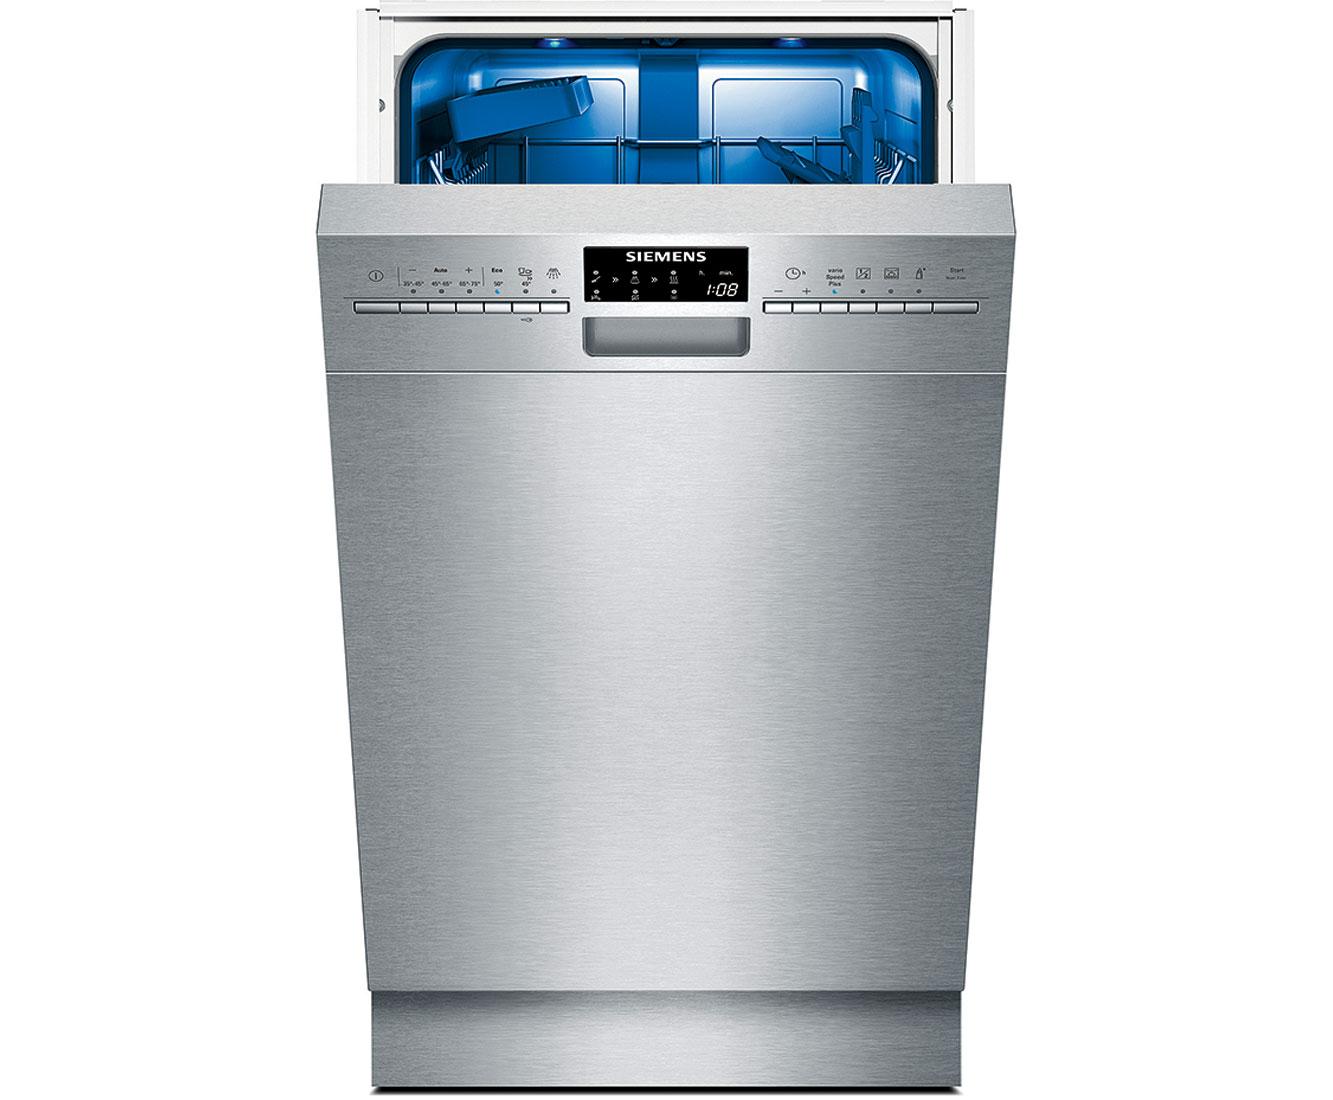 Wonderful Siemens IQ500 SR46T557EU Unterbau Geschirrspüler   45 Cm, Edelstahl, A++ Awesome Design